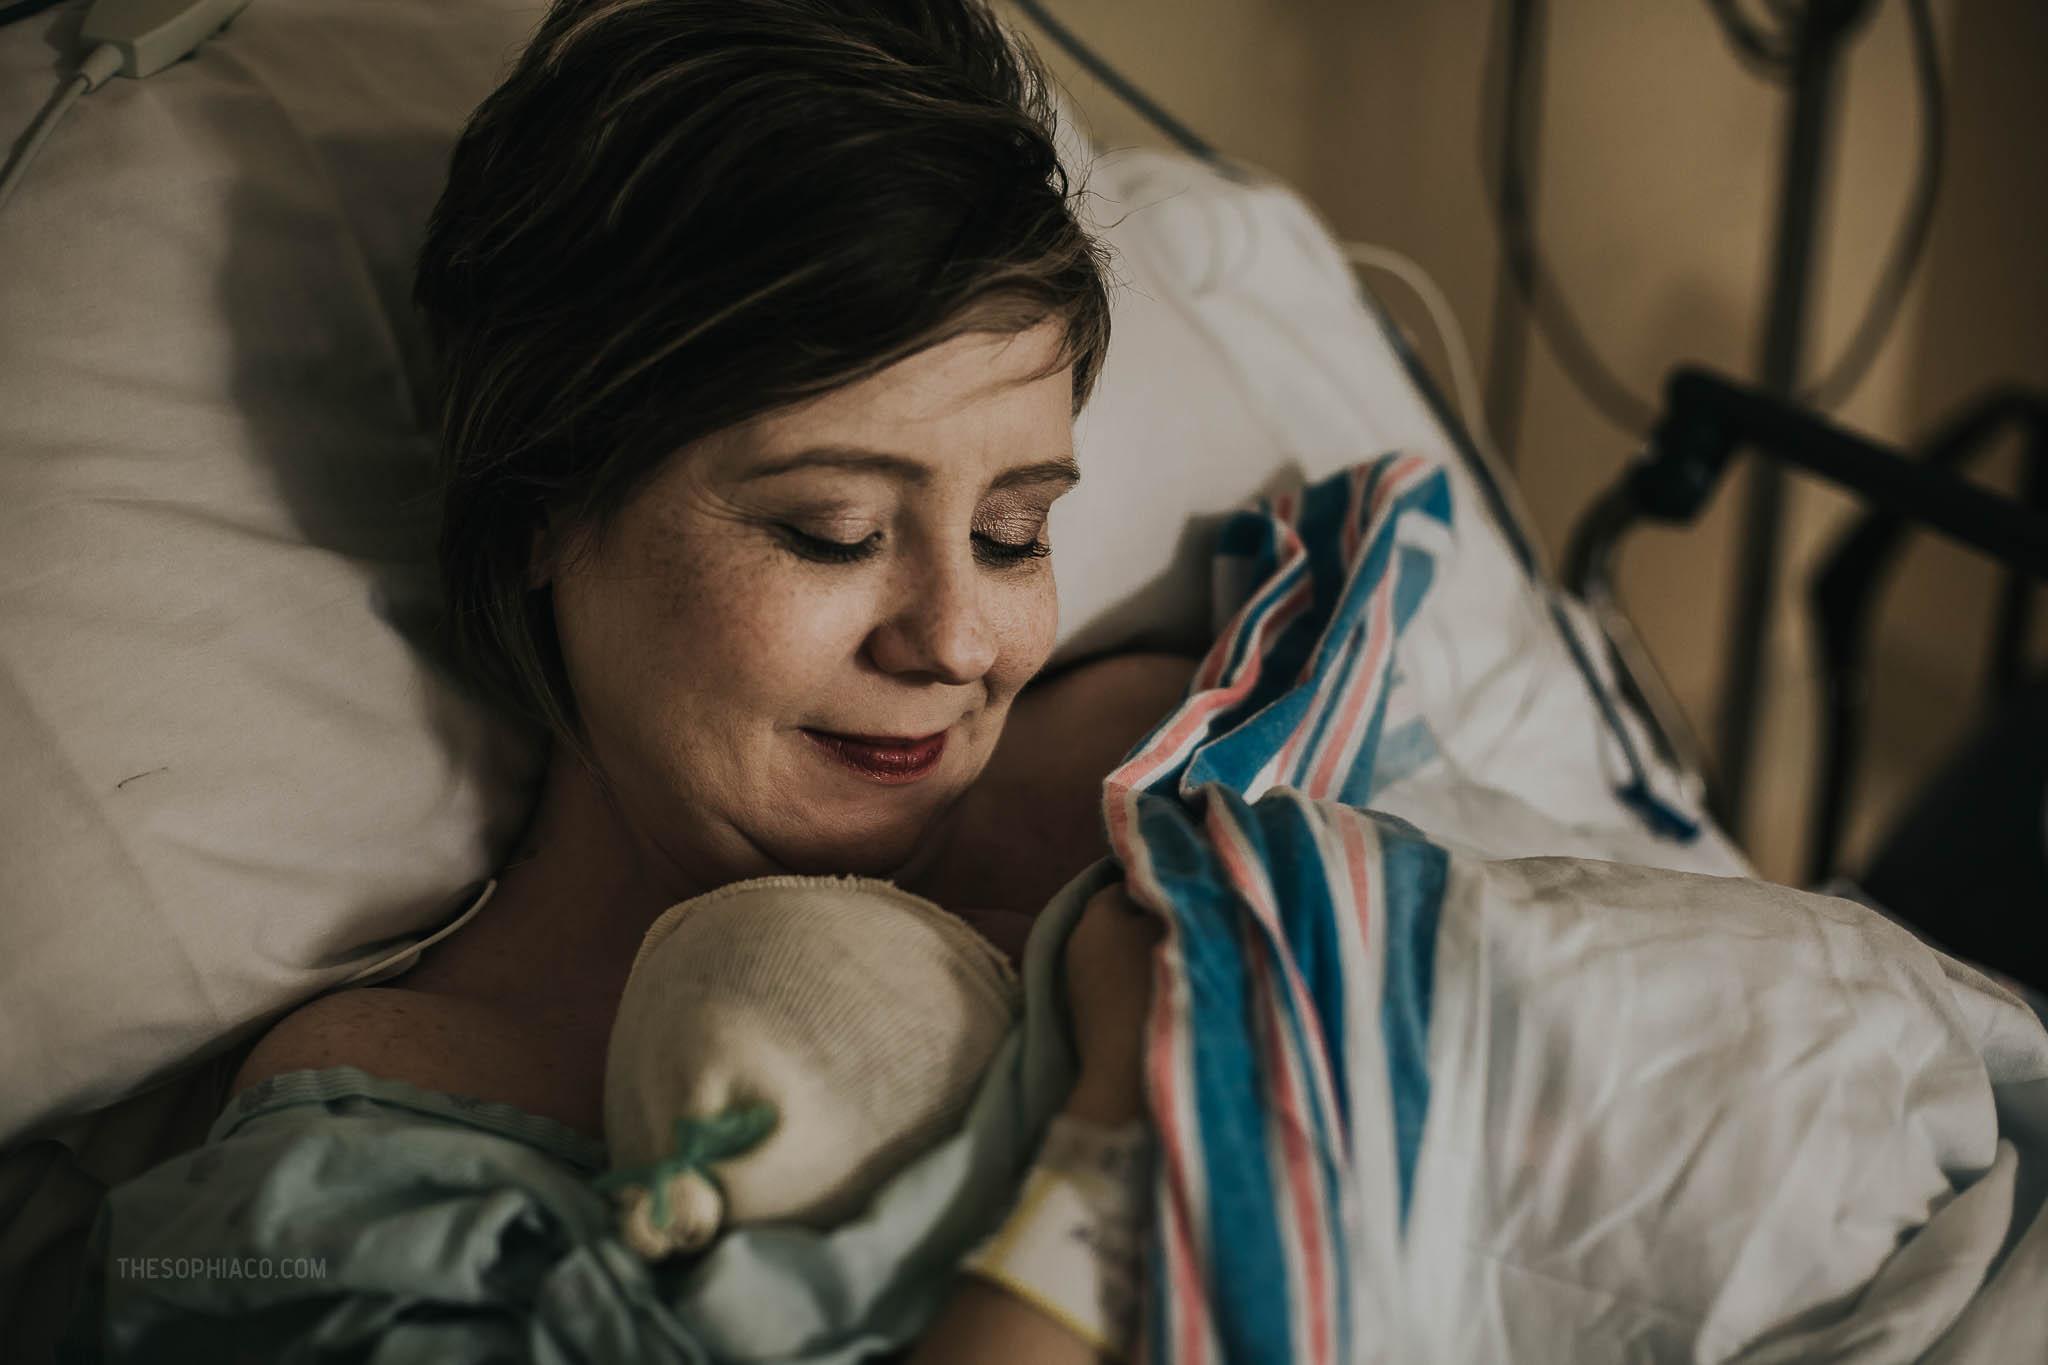 Oahu-Birth-Photographer-scheduled-cesarean-kaiser-33.jpg